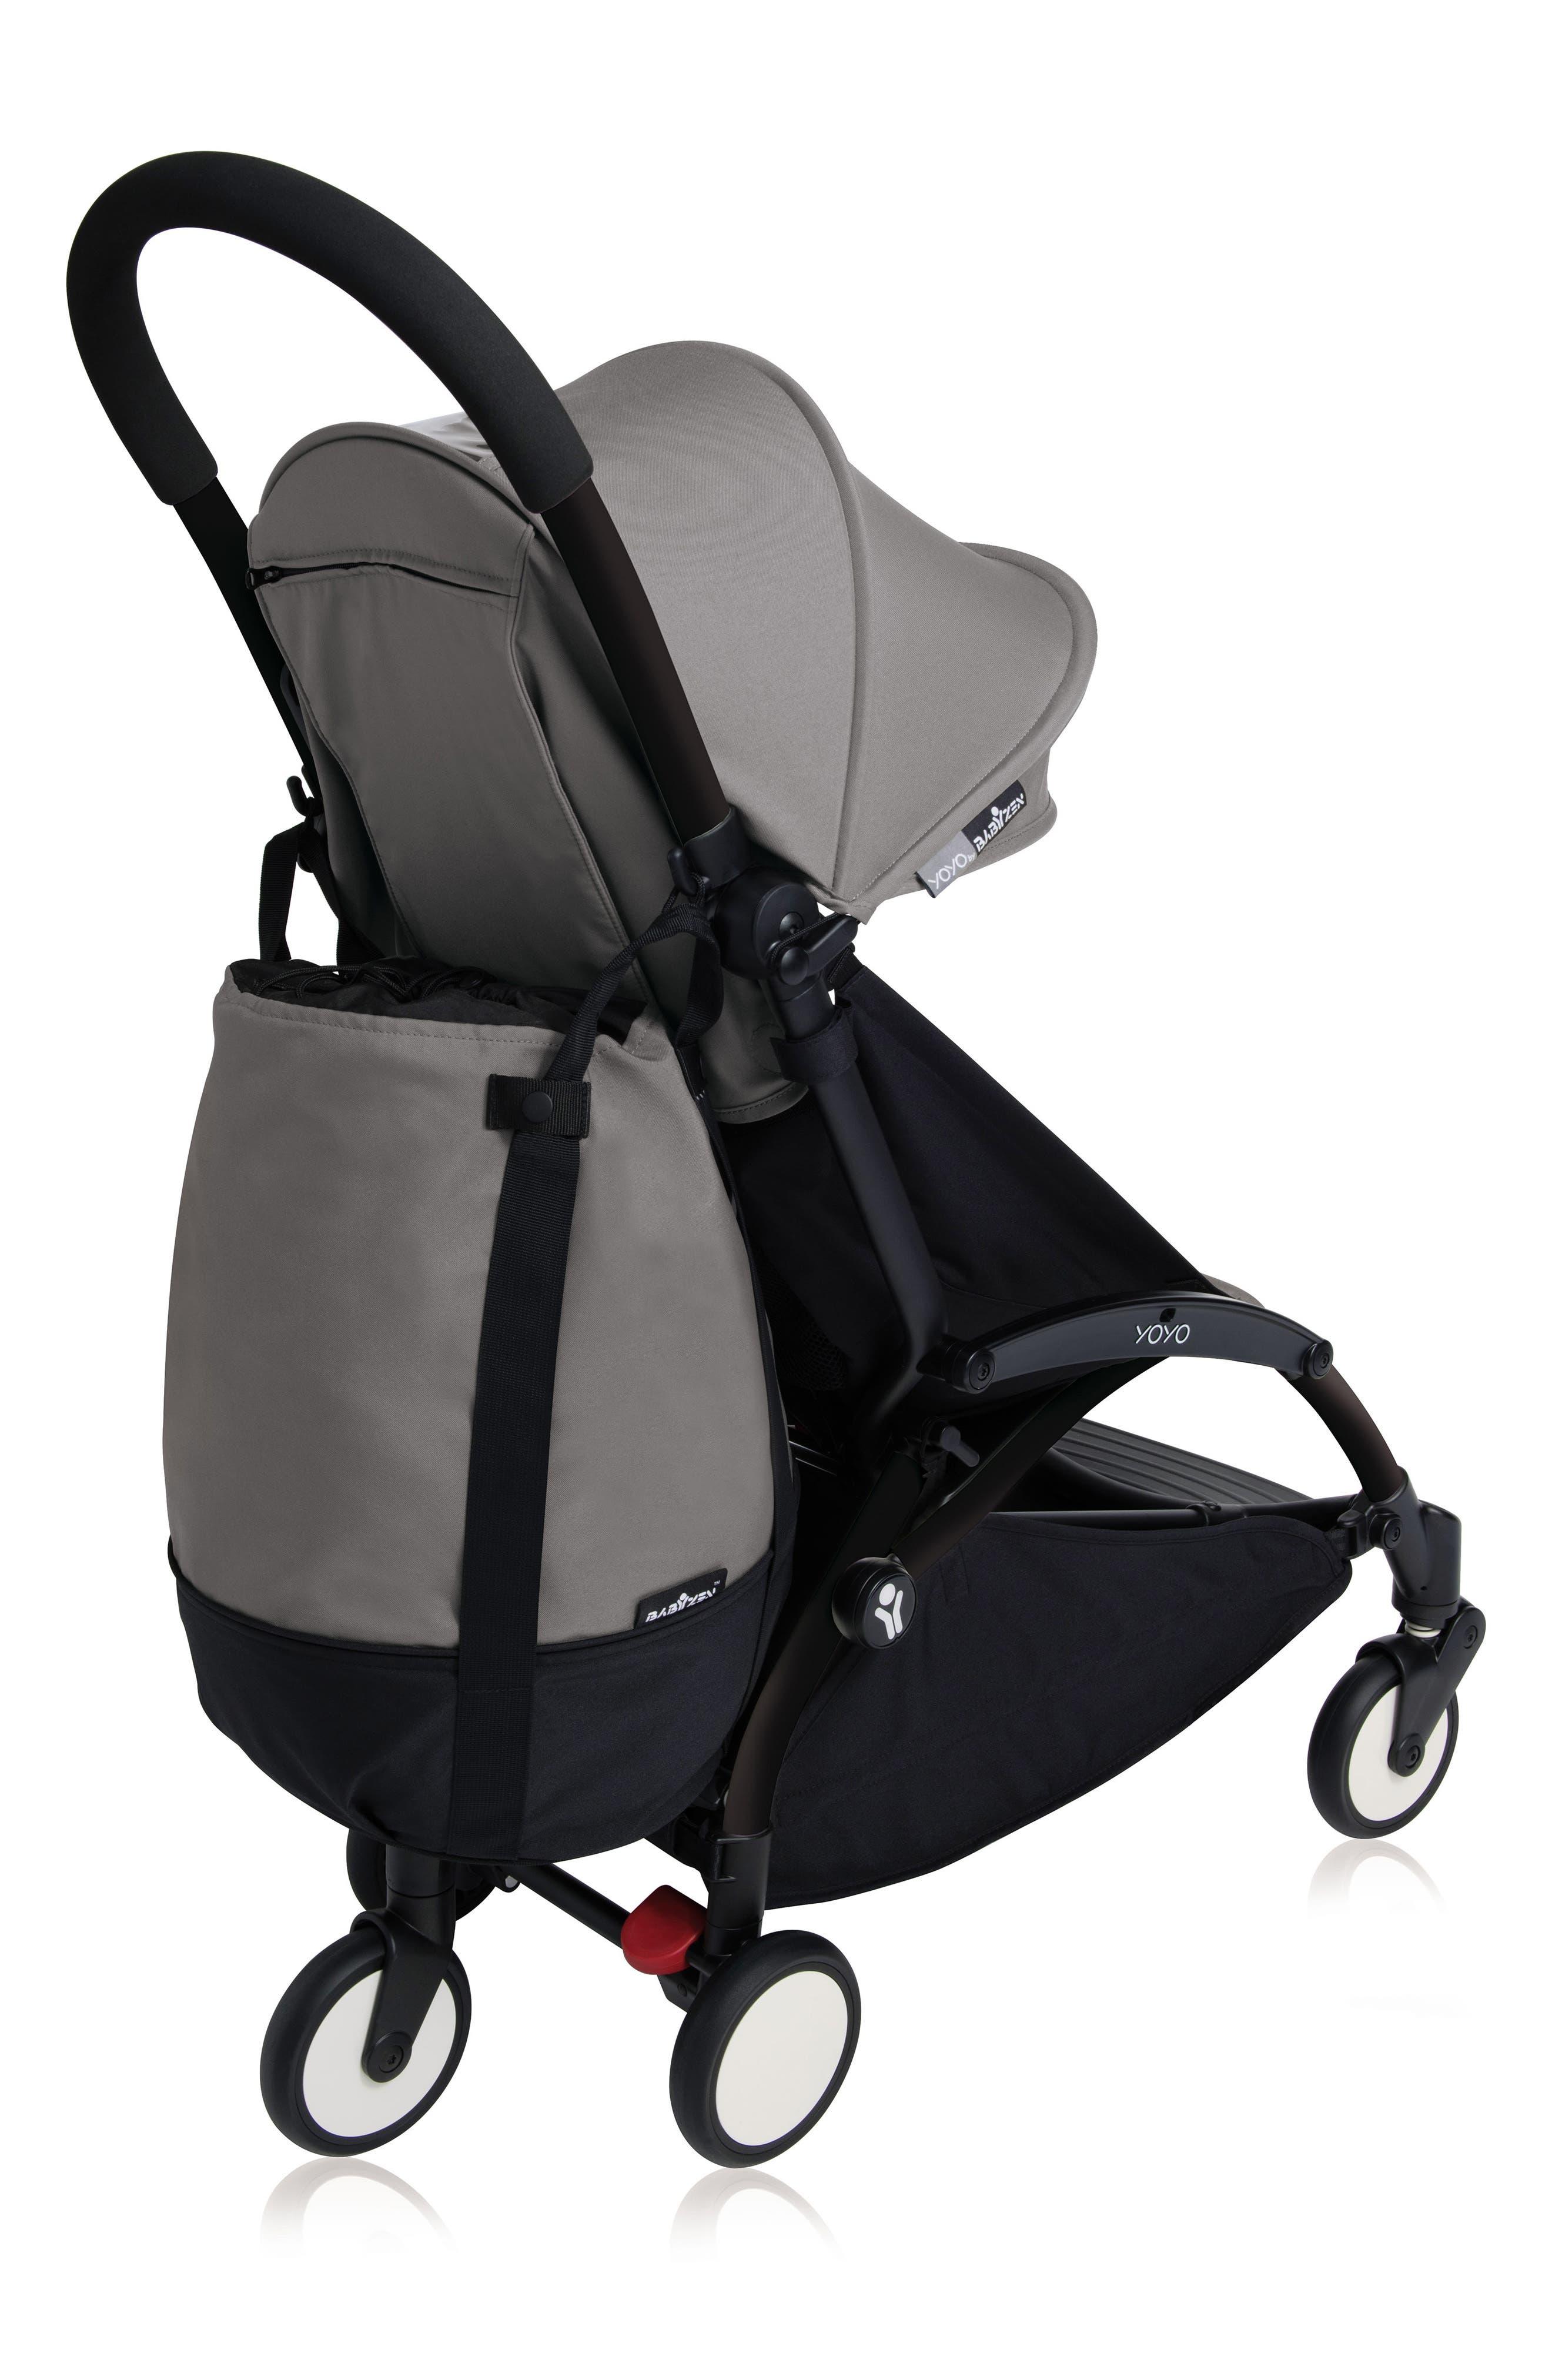 Infant Babyzen(TM) Yoyo Rolling Stroller Bag